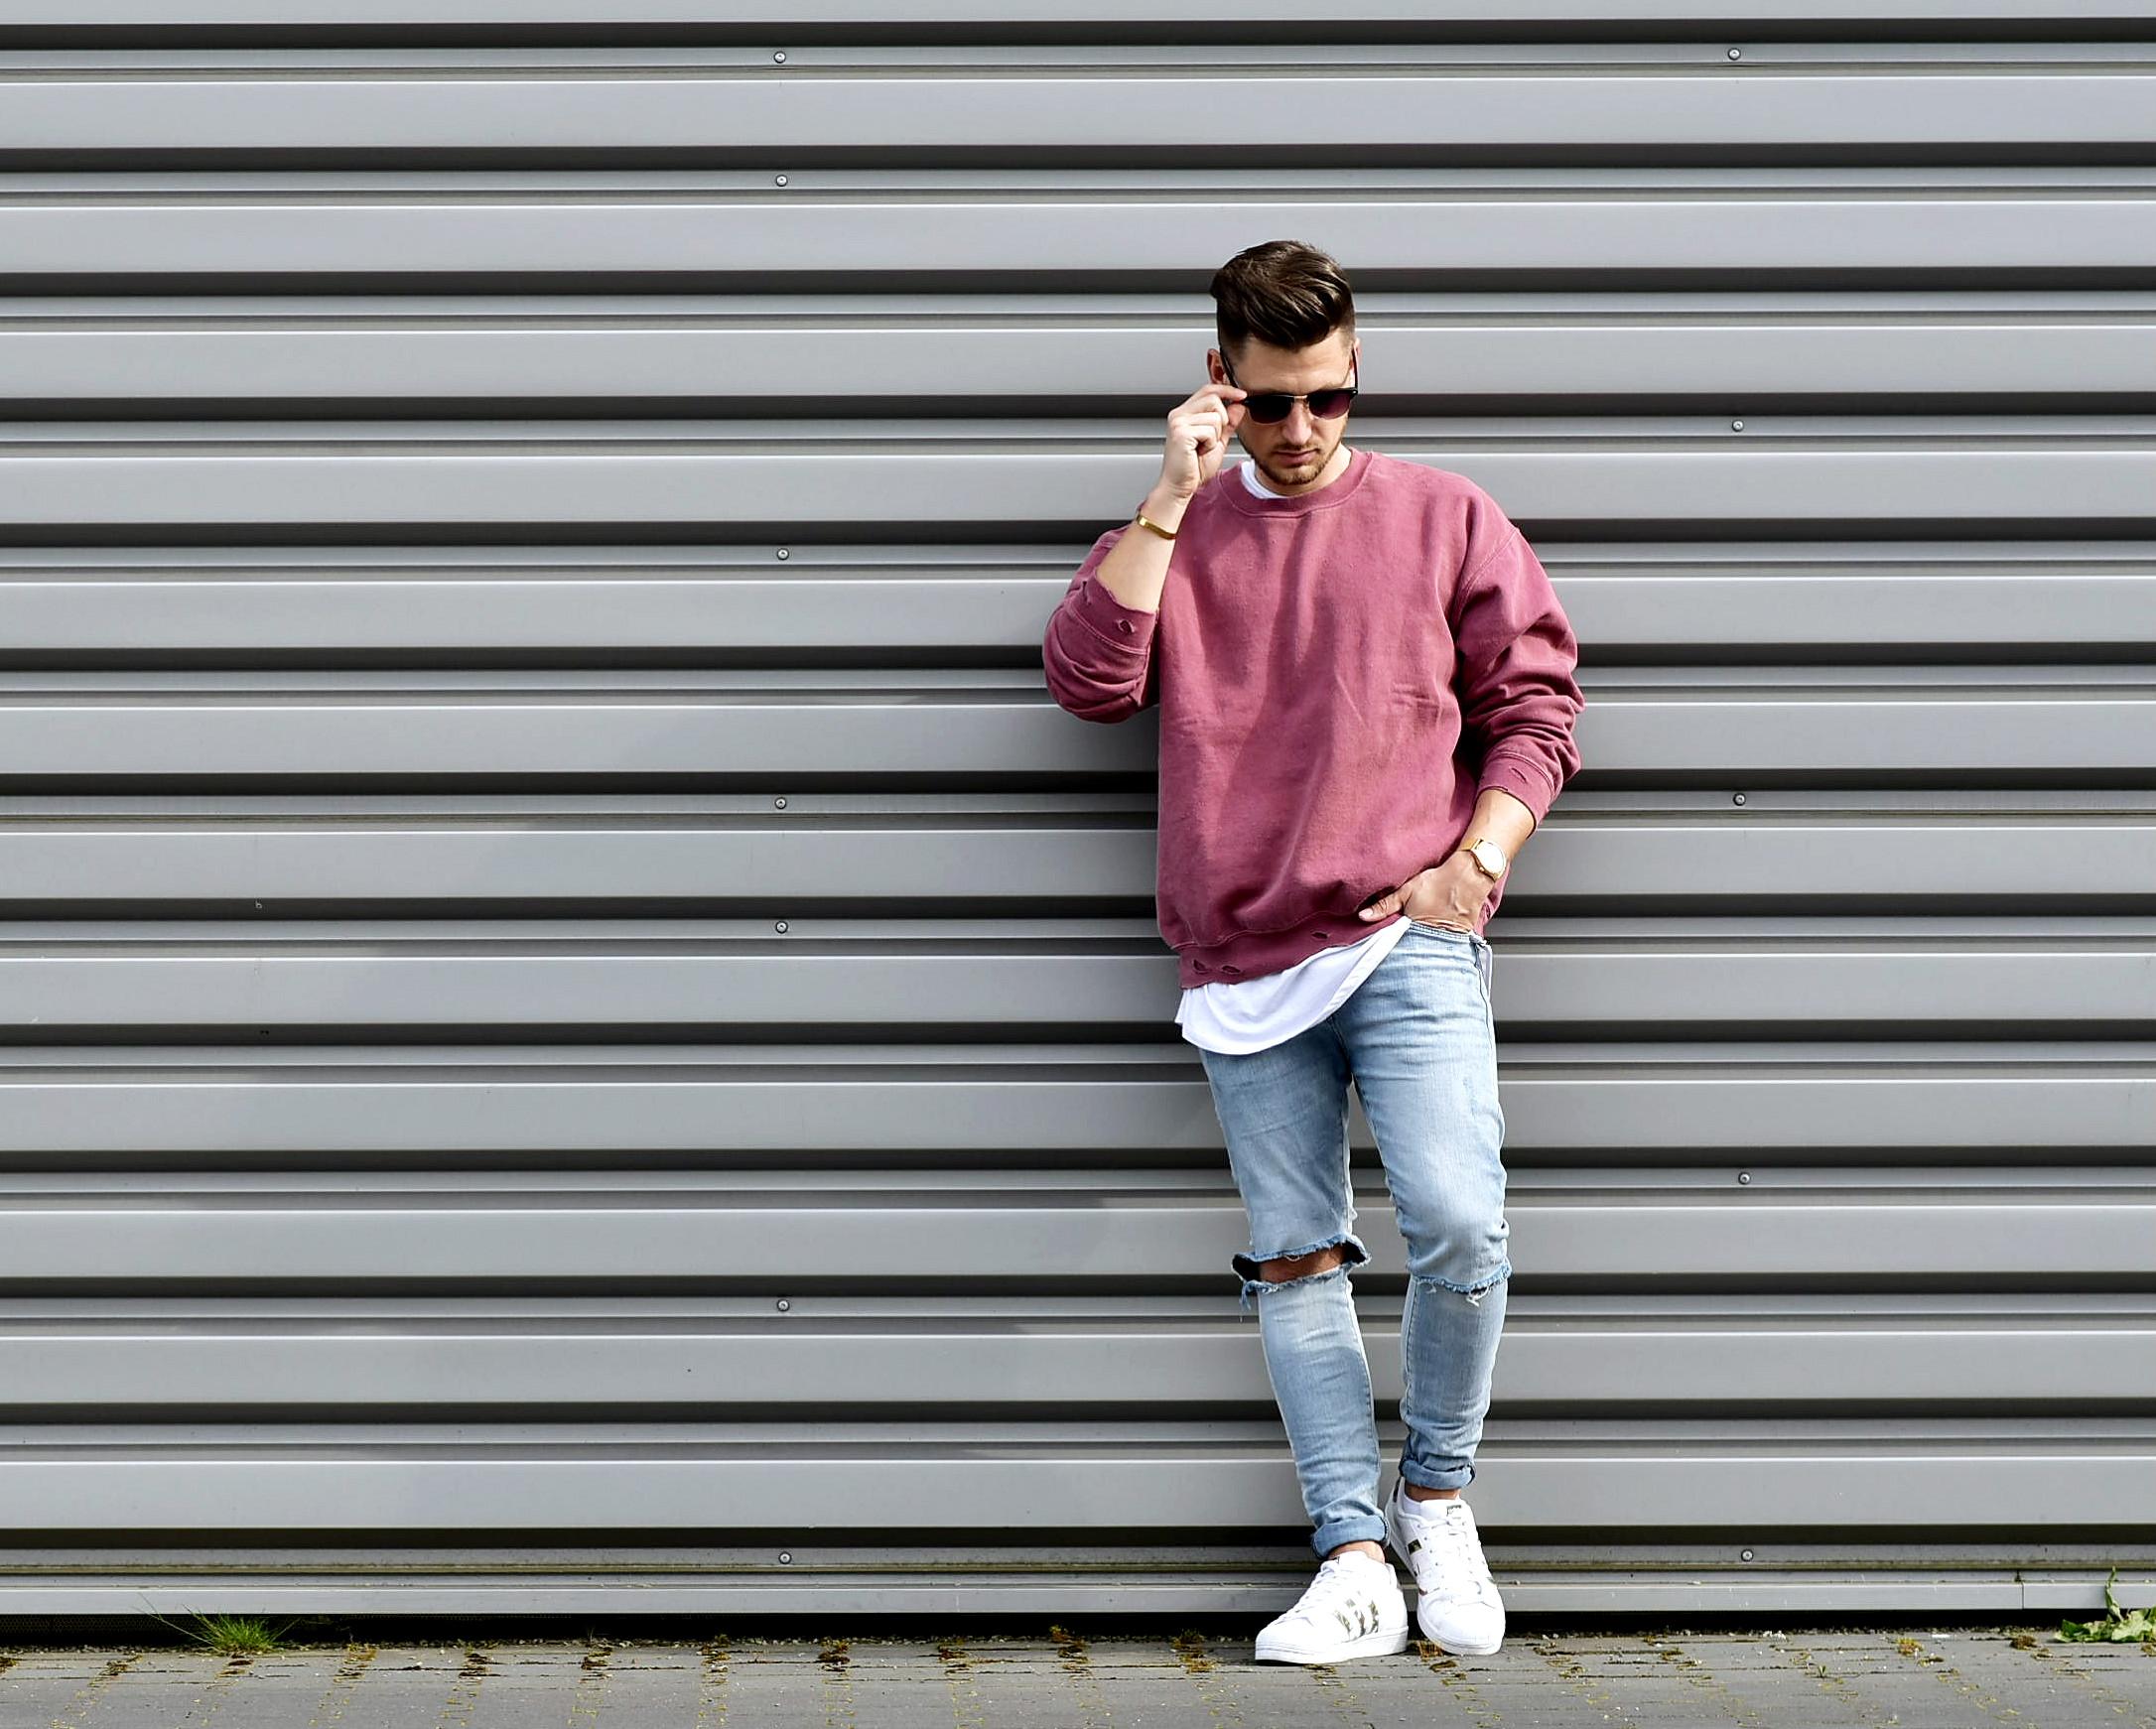 Tommeezjerry-Styleblog-Männerblog-Männer-Modeblog-Berlin-Berlinblog-Outfit-Streetlook-Vintage-Retro-Oversized-Adidas-Superstar-Skinny-Jeans-Rosa-Used-Rotrosa